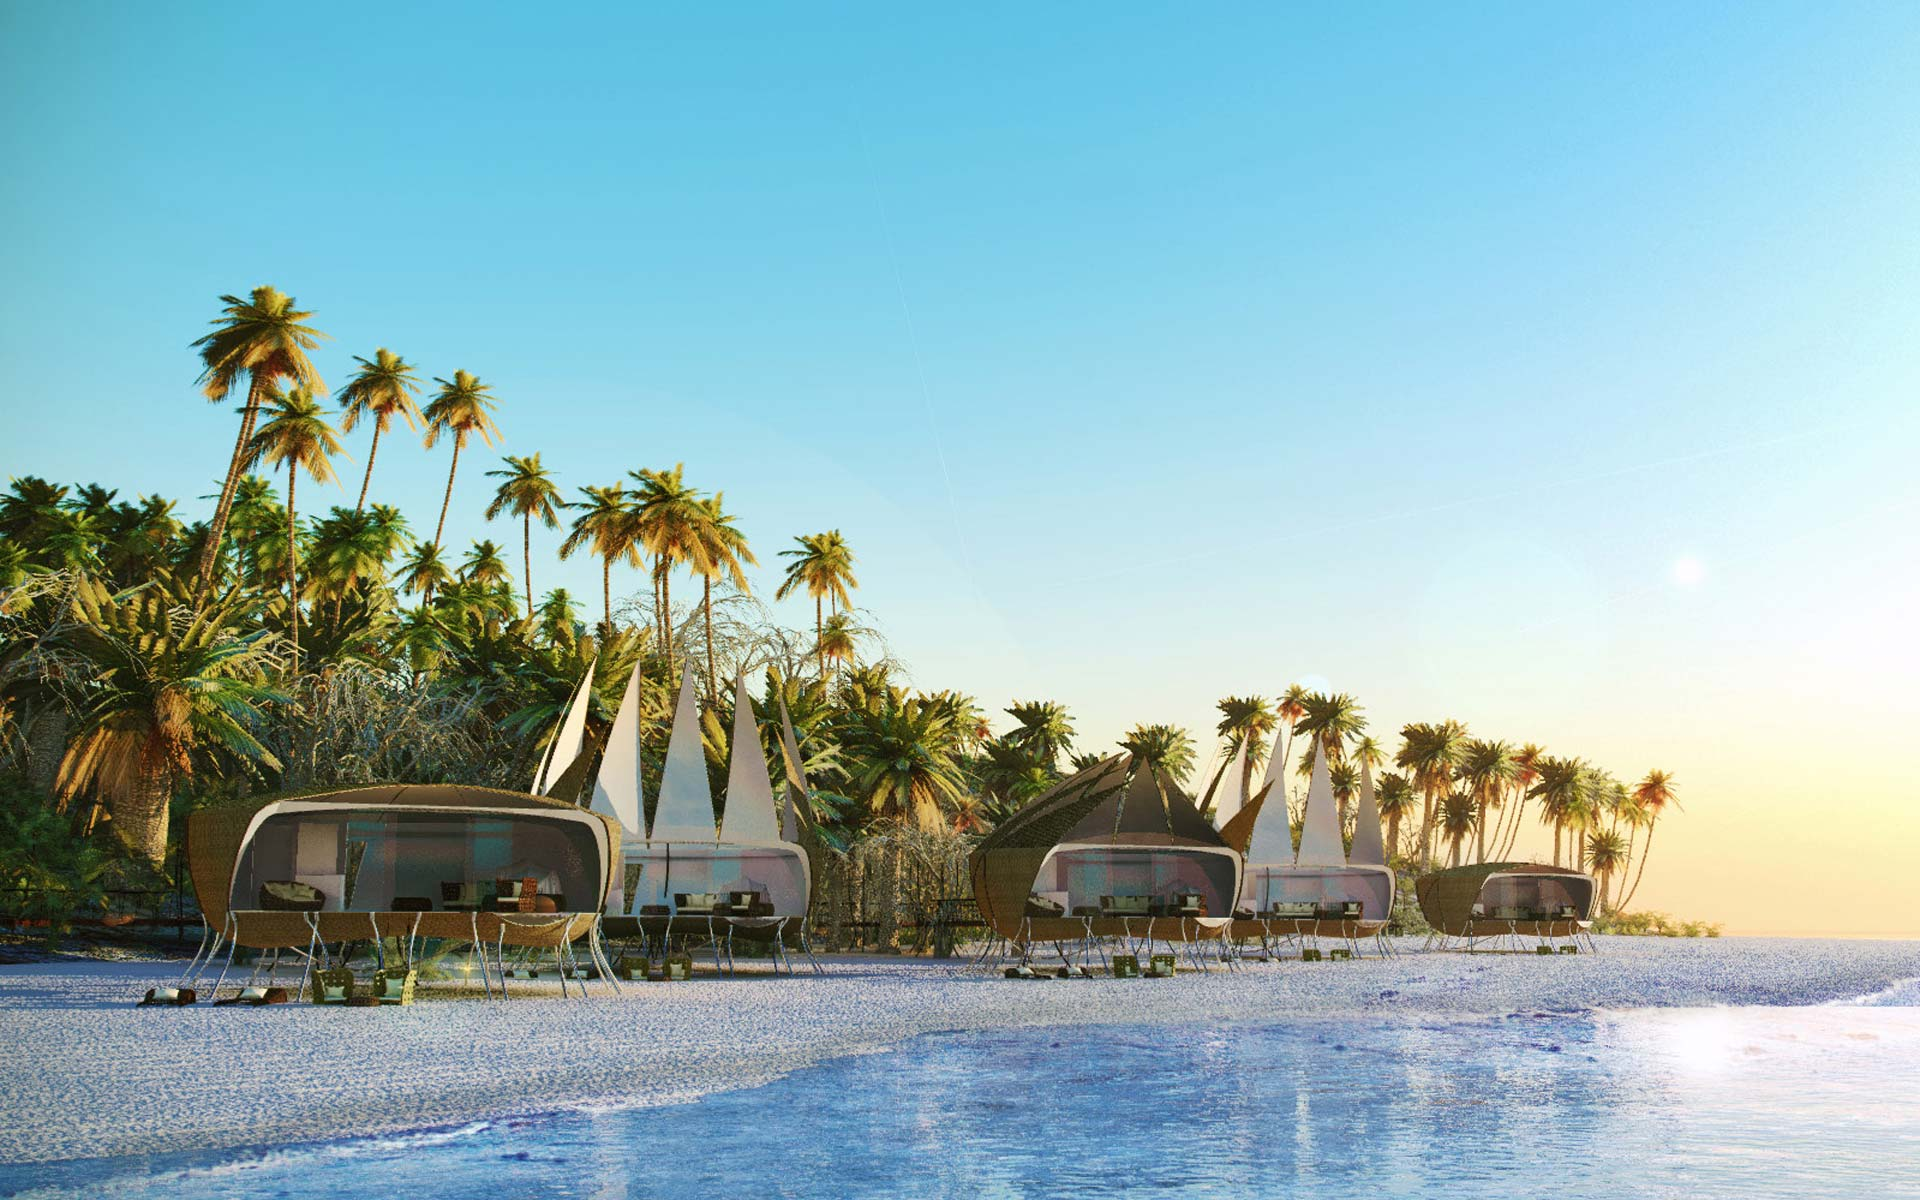 arquitectura desmontable, hospitality glamping, cabañas desde la playa